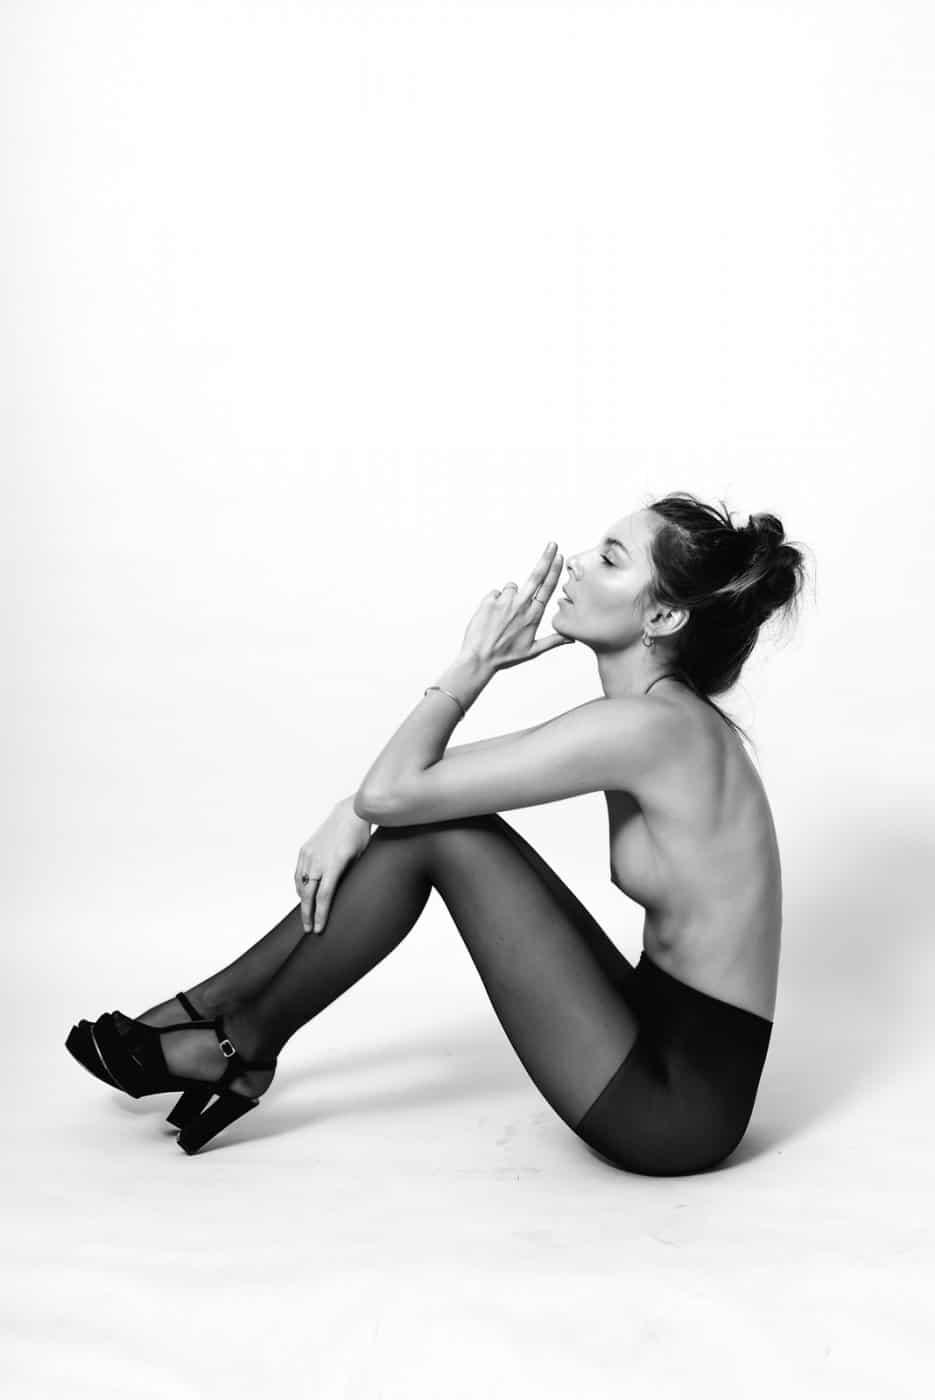 Portrait Studio Photography By Anastasia Vervueren Lingerie Black And White